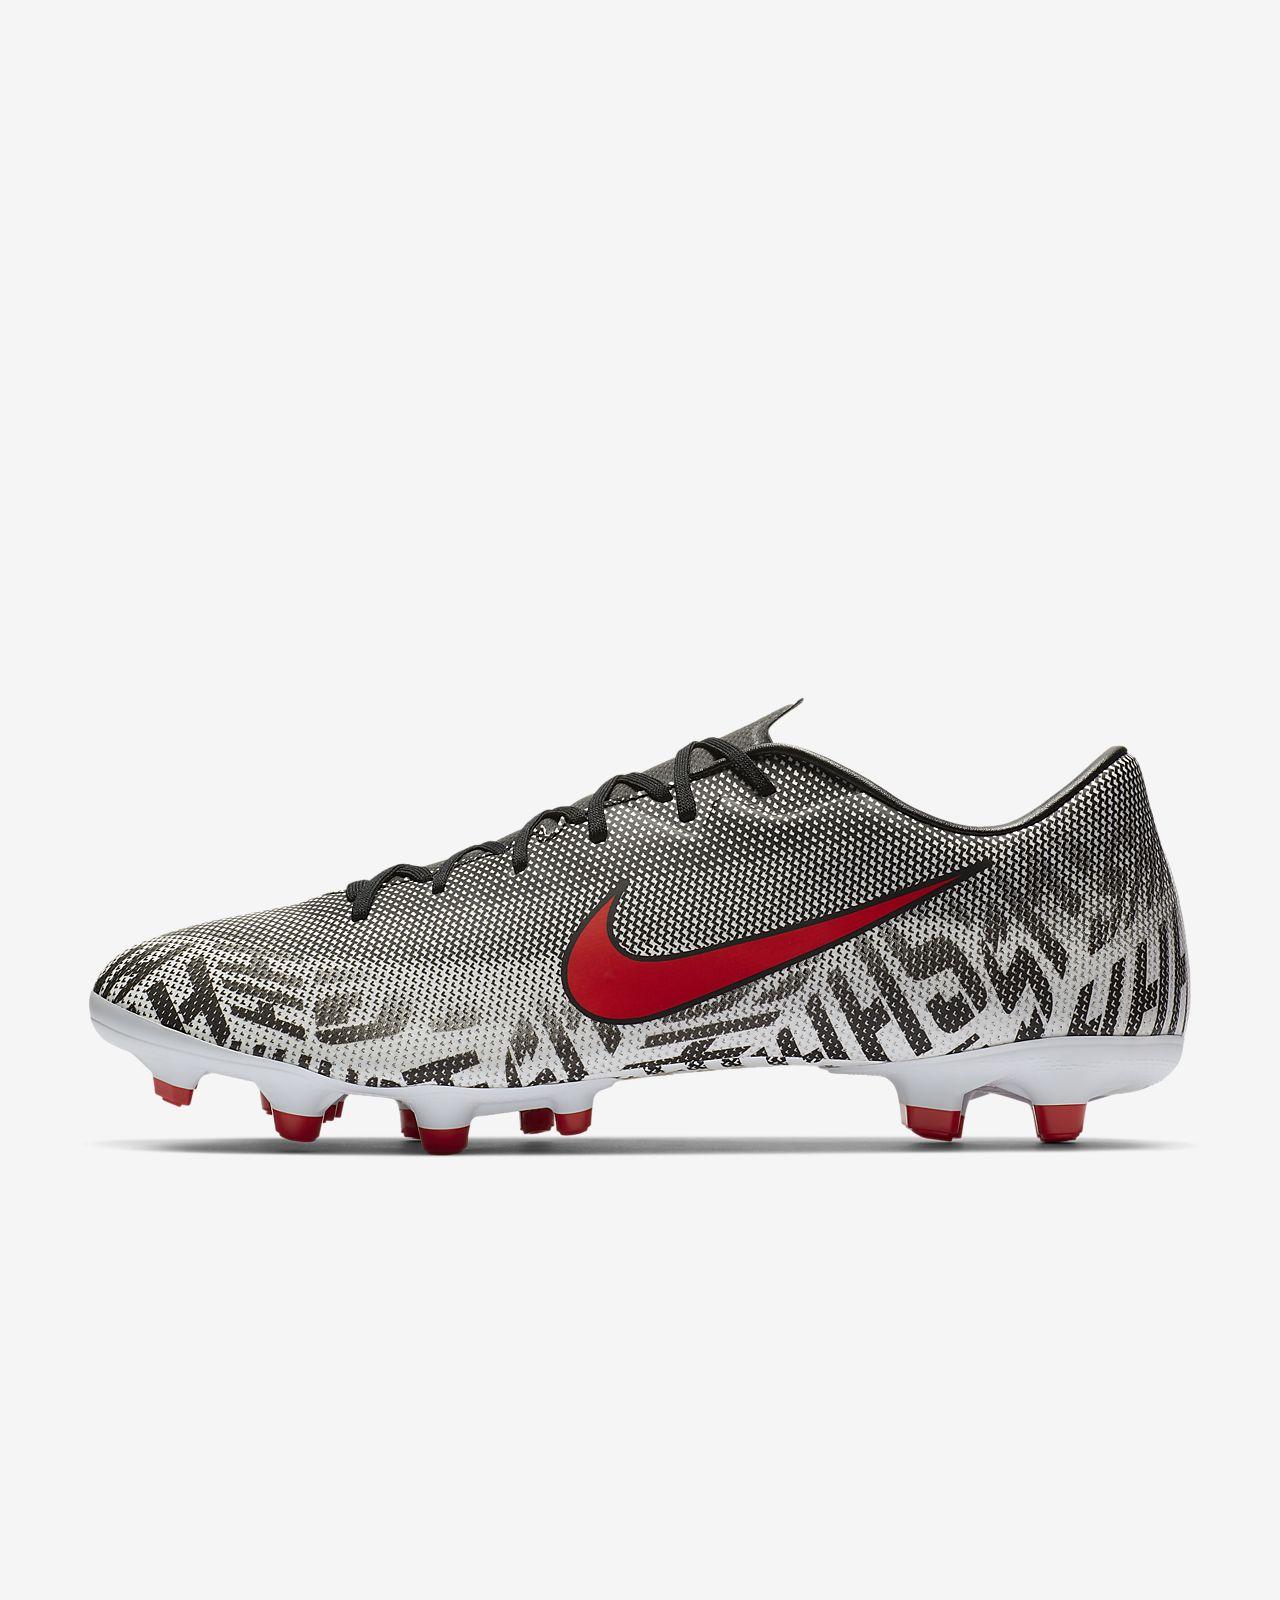 Academy Football De Nike Multi À Chaussure Neymar Terrains Xii Crampons Mercurial Vapor f7mIYbv6gy